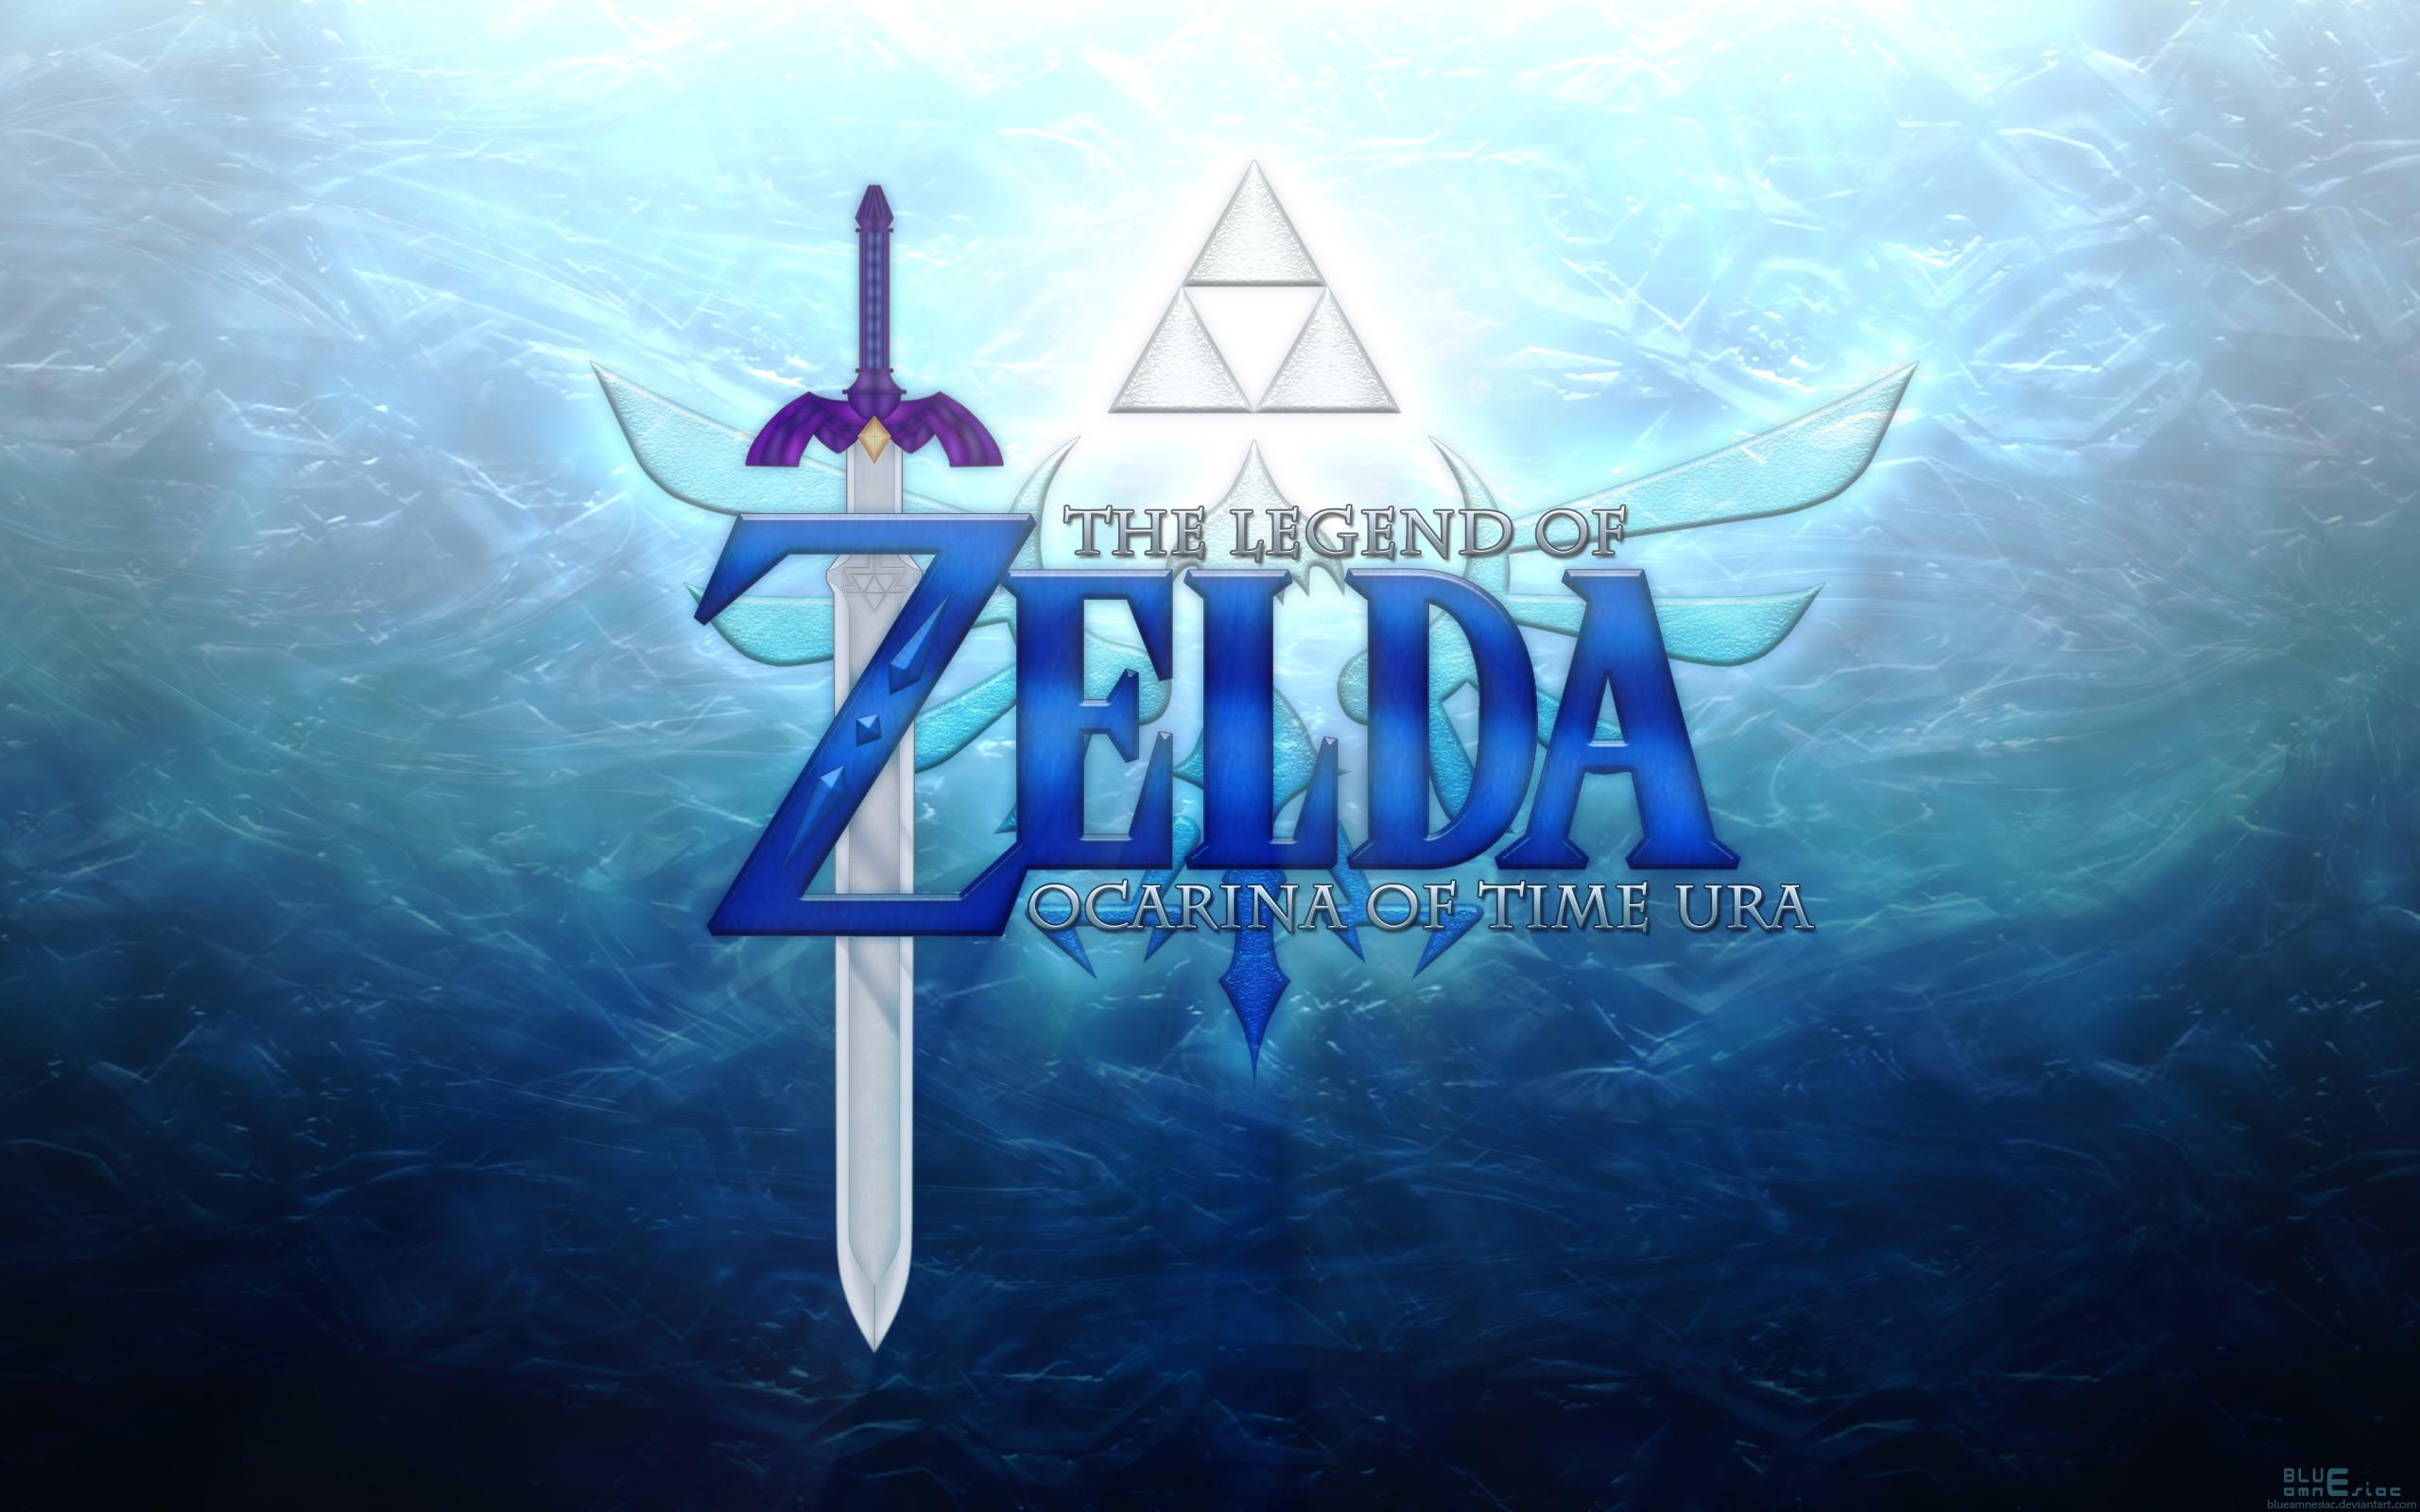 The Legend of Zelda Ocarina of Time [ wallpaper Game   HD Wallpapers    Pinterest   Wallpaper and Hd wallpaper